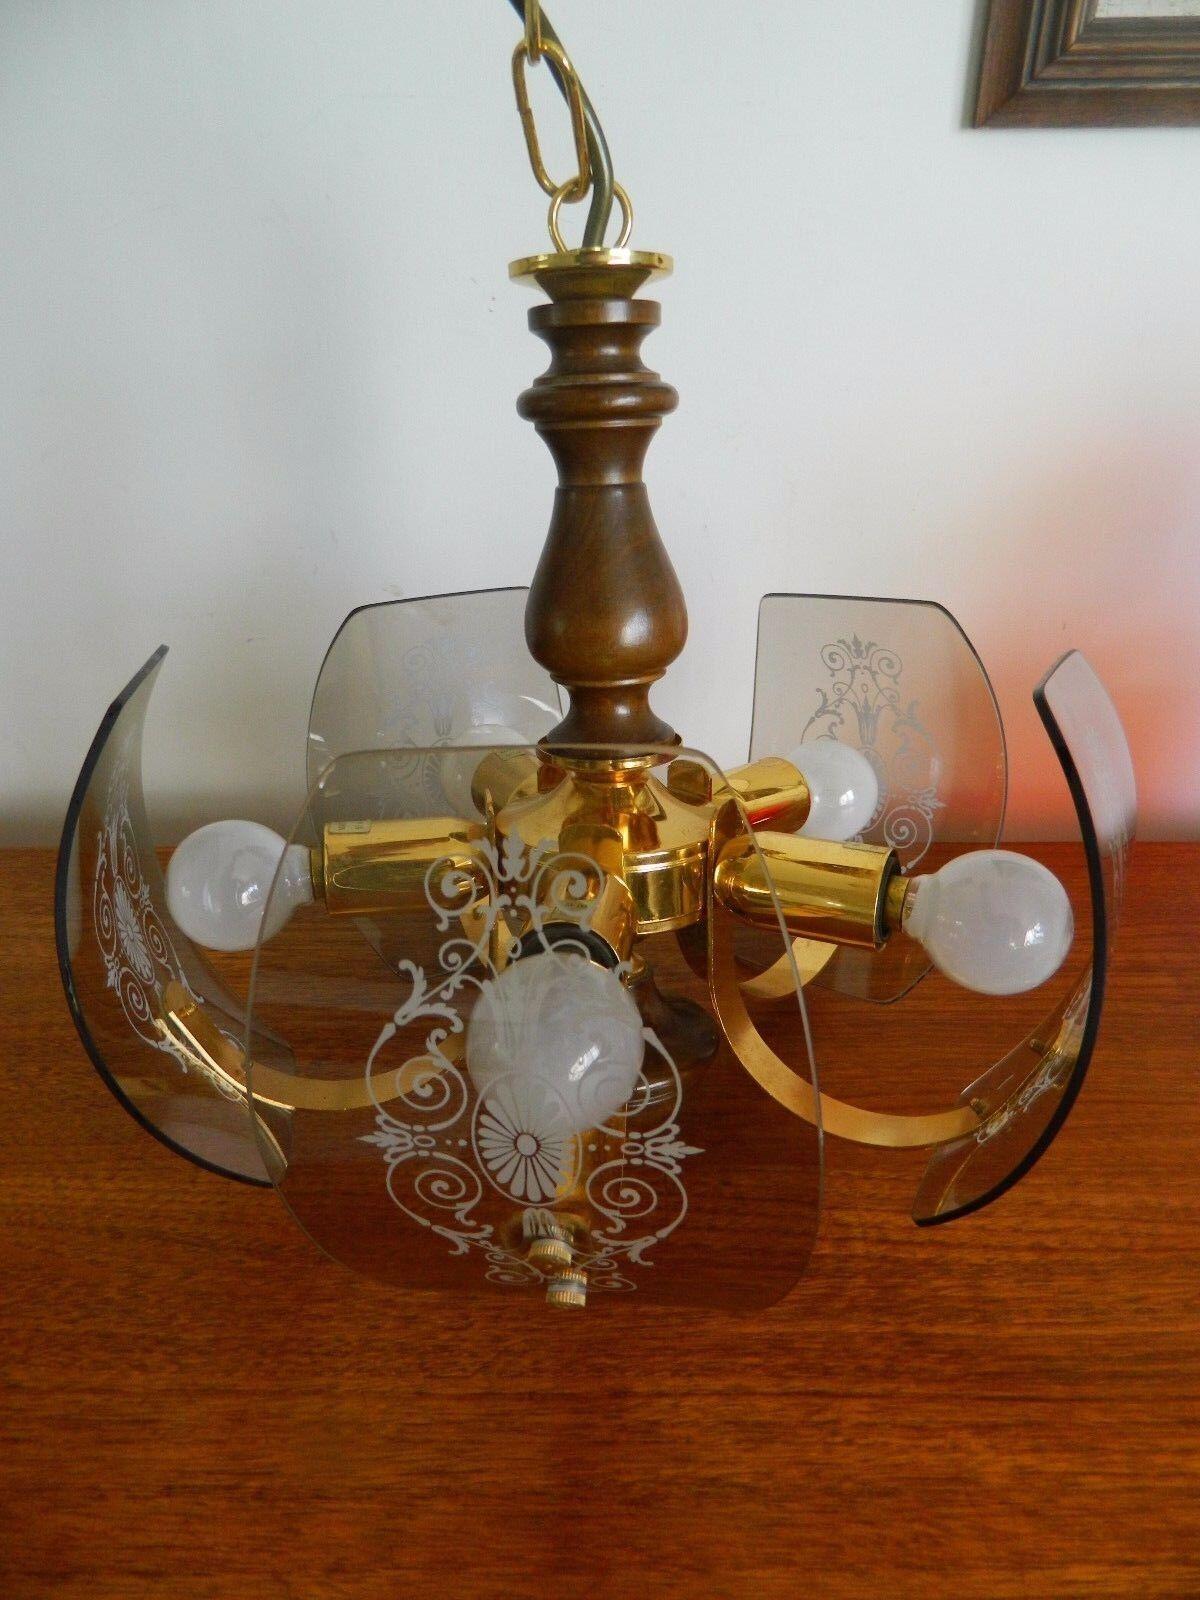 Stunning Italian Retro 20thc Brass Wood Ornate Design Ceiling Light Etched Glass